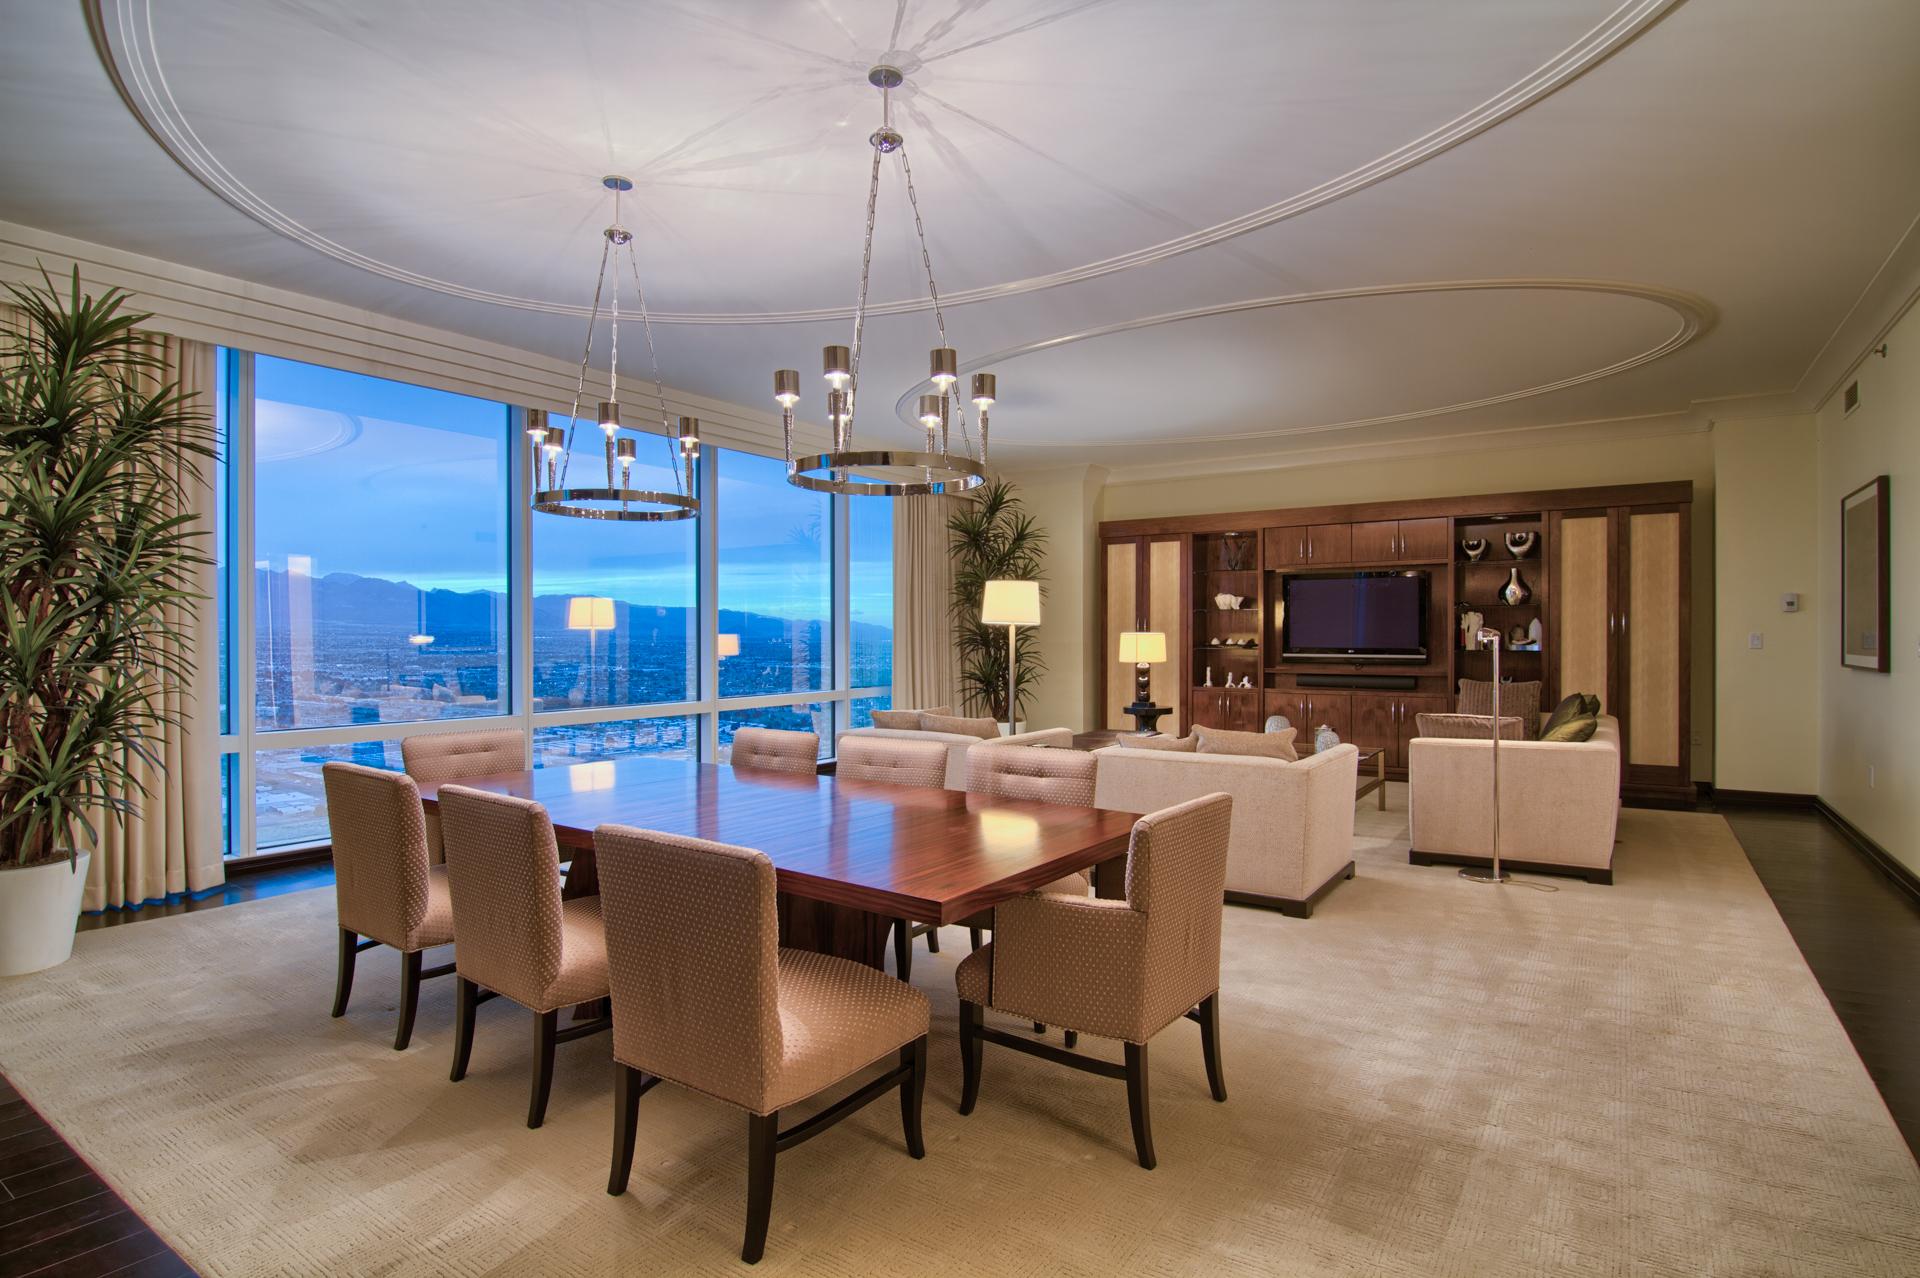 Trump Hotel Las Vegas 2000 Fashion Show Dr Las Vegas Nv 89109 Suite 6108 Luxury Homes Photography